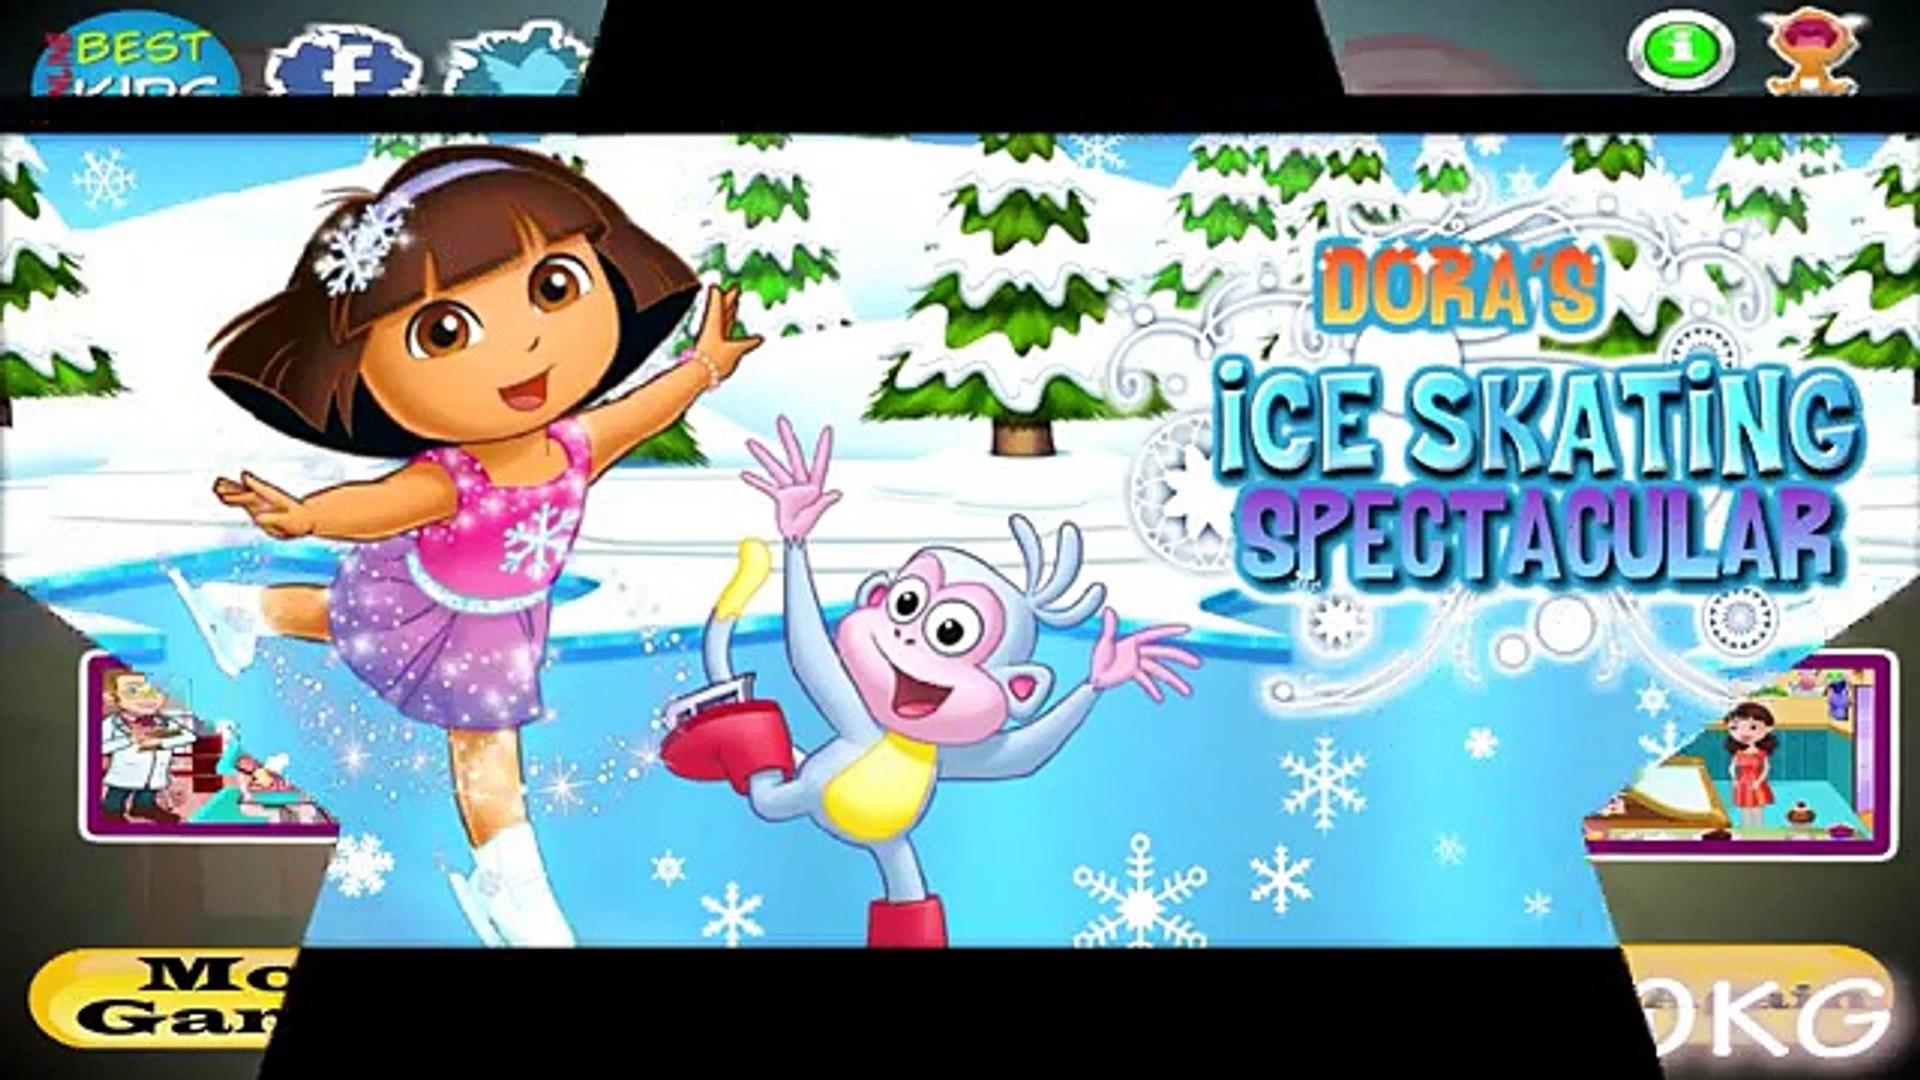 Winter party activities for kids